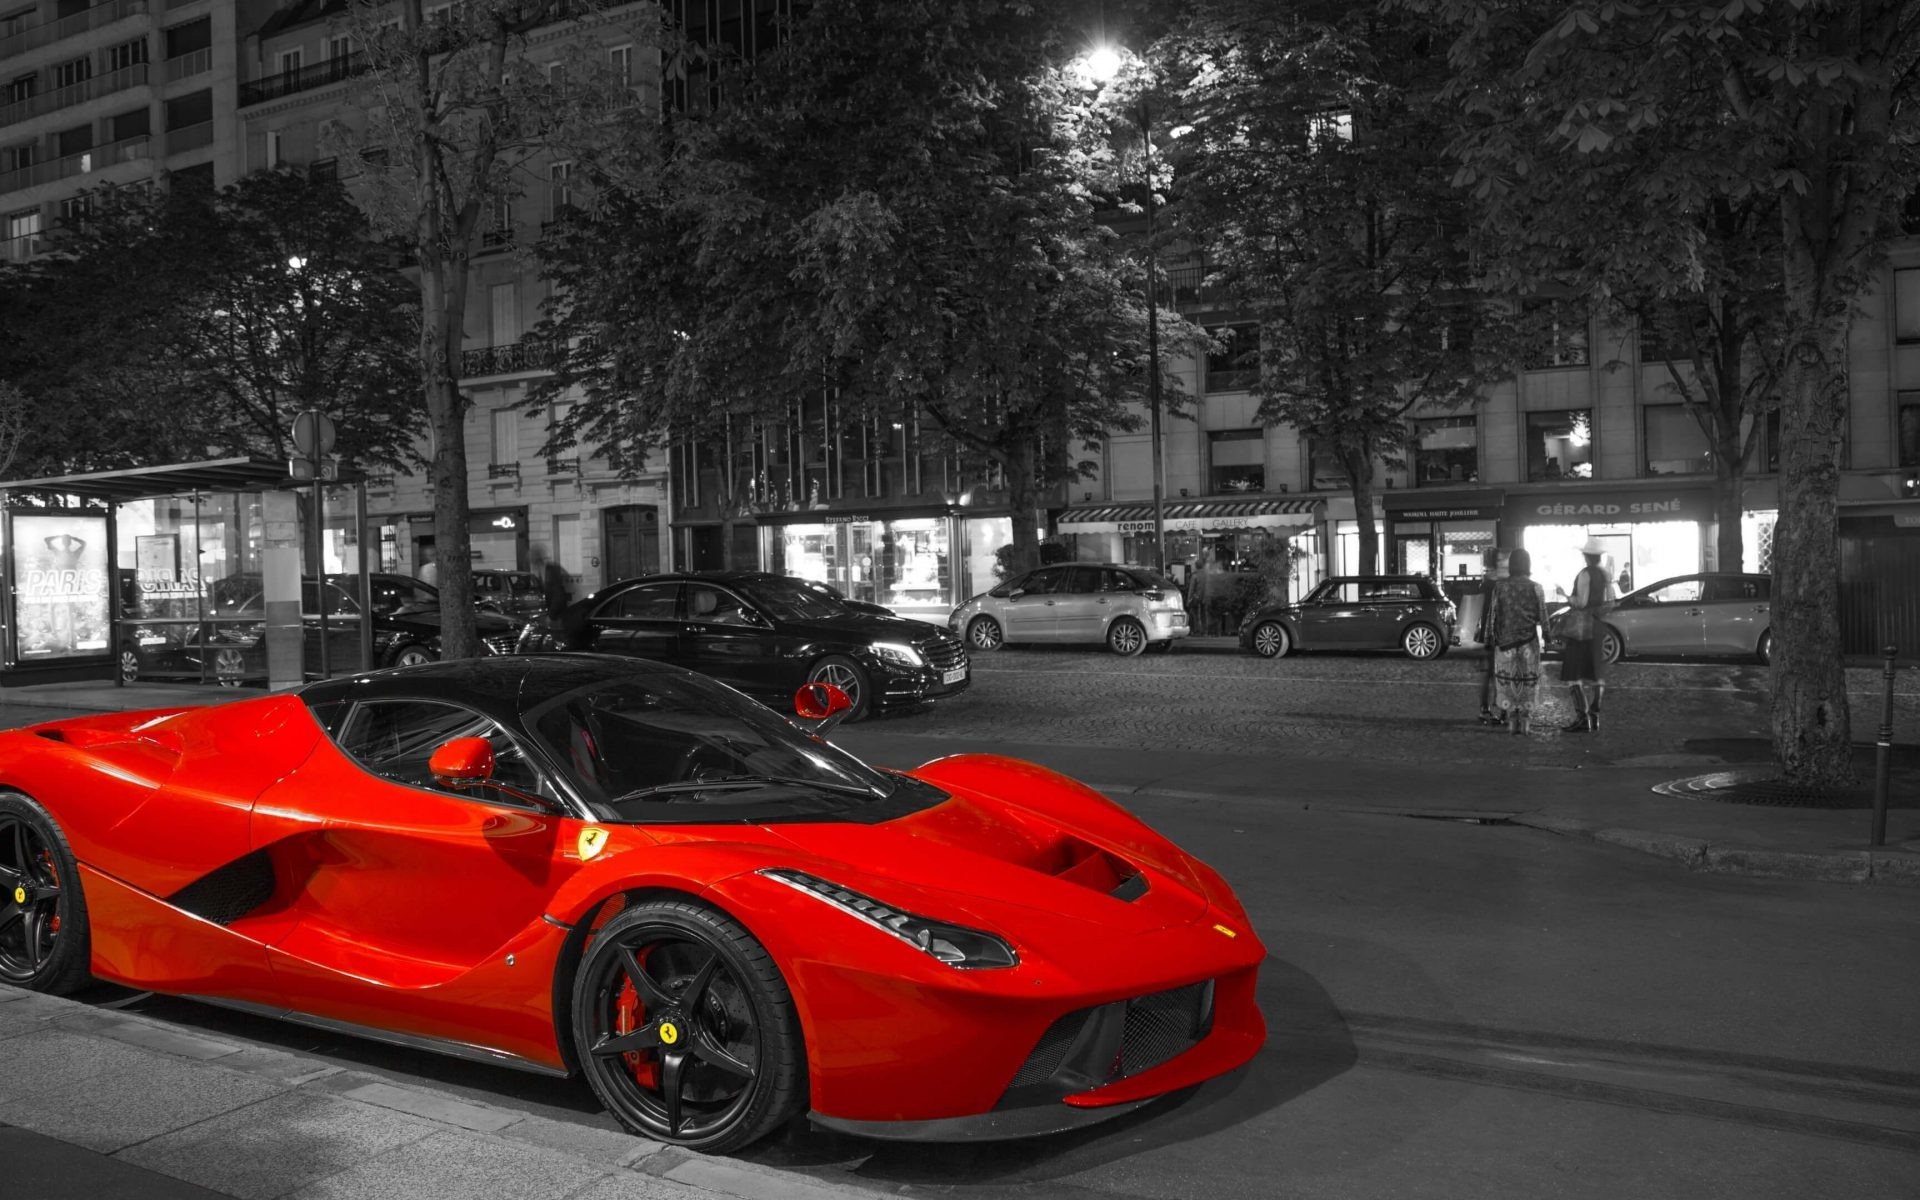 Ferrari LaFerrari Red Supercar 4K Wallpaper